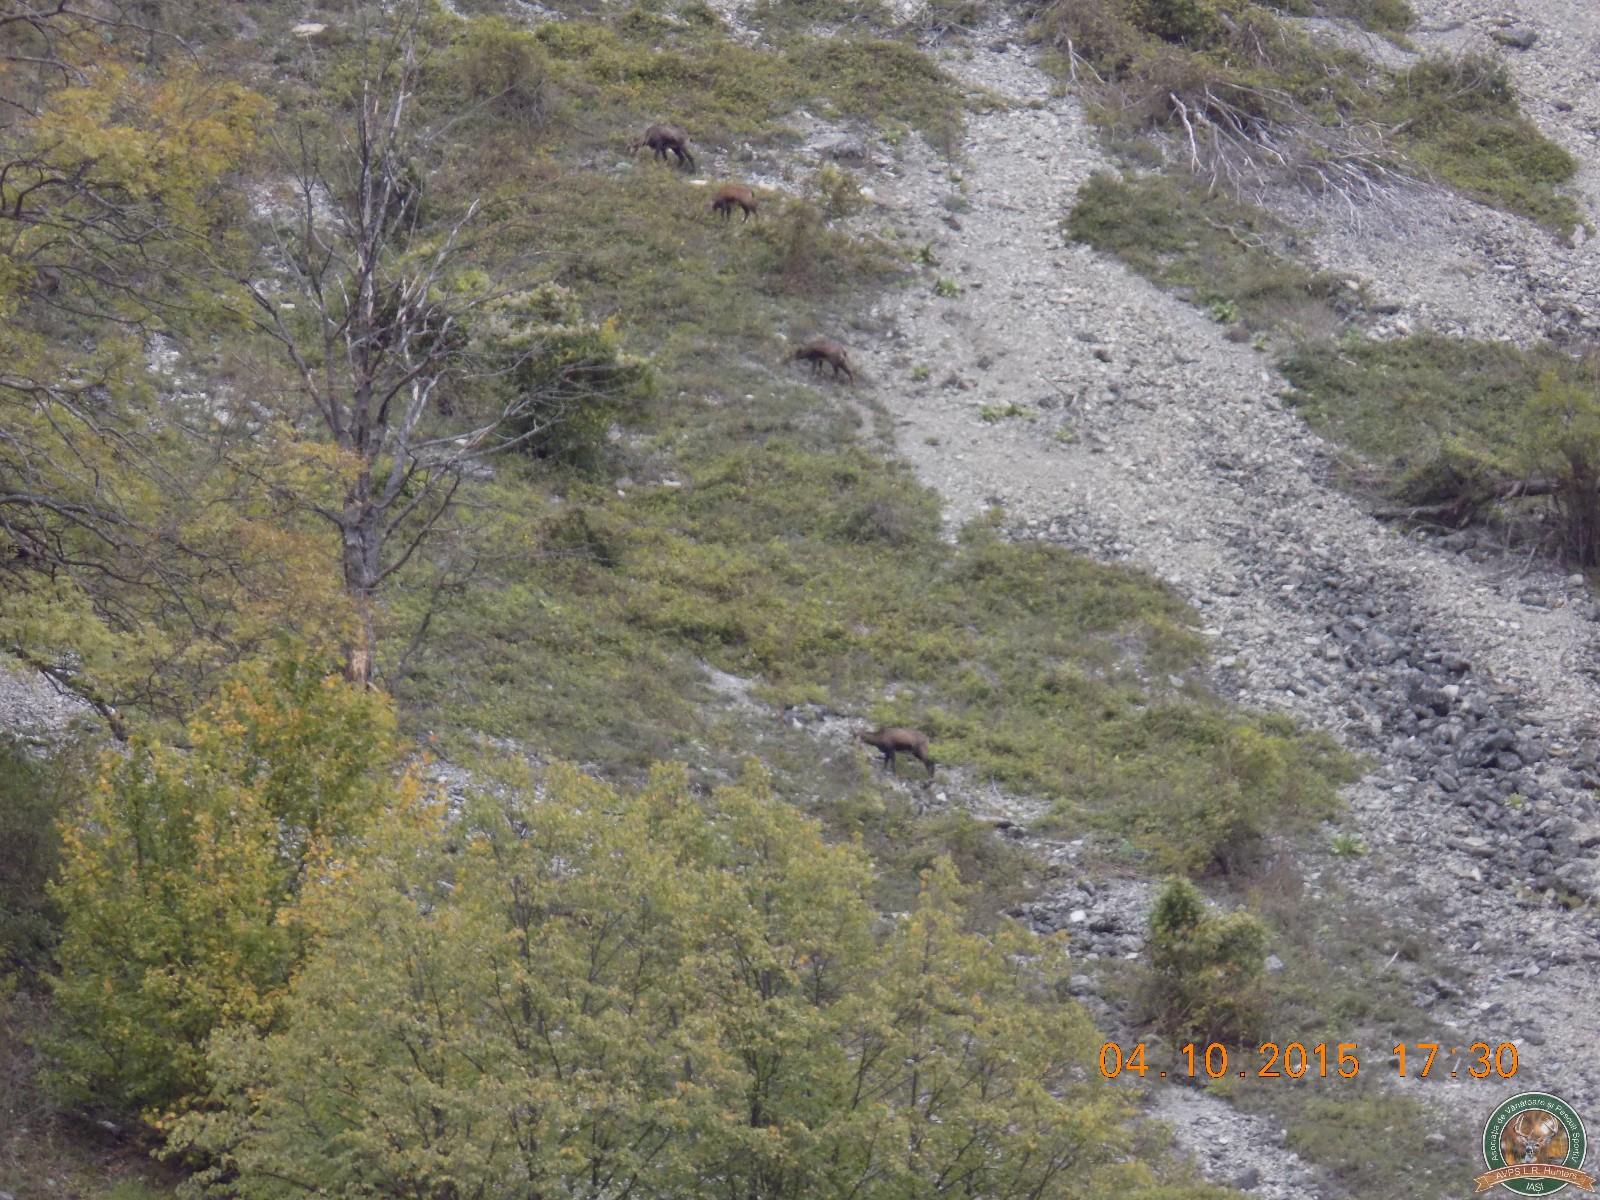 avps-lr-hunters-lepsa_20-57